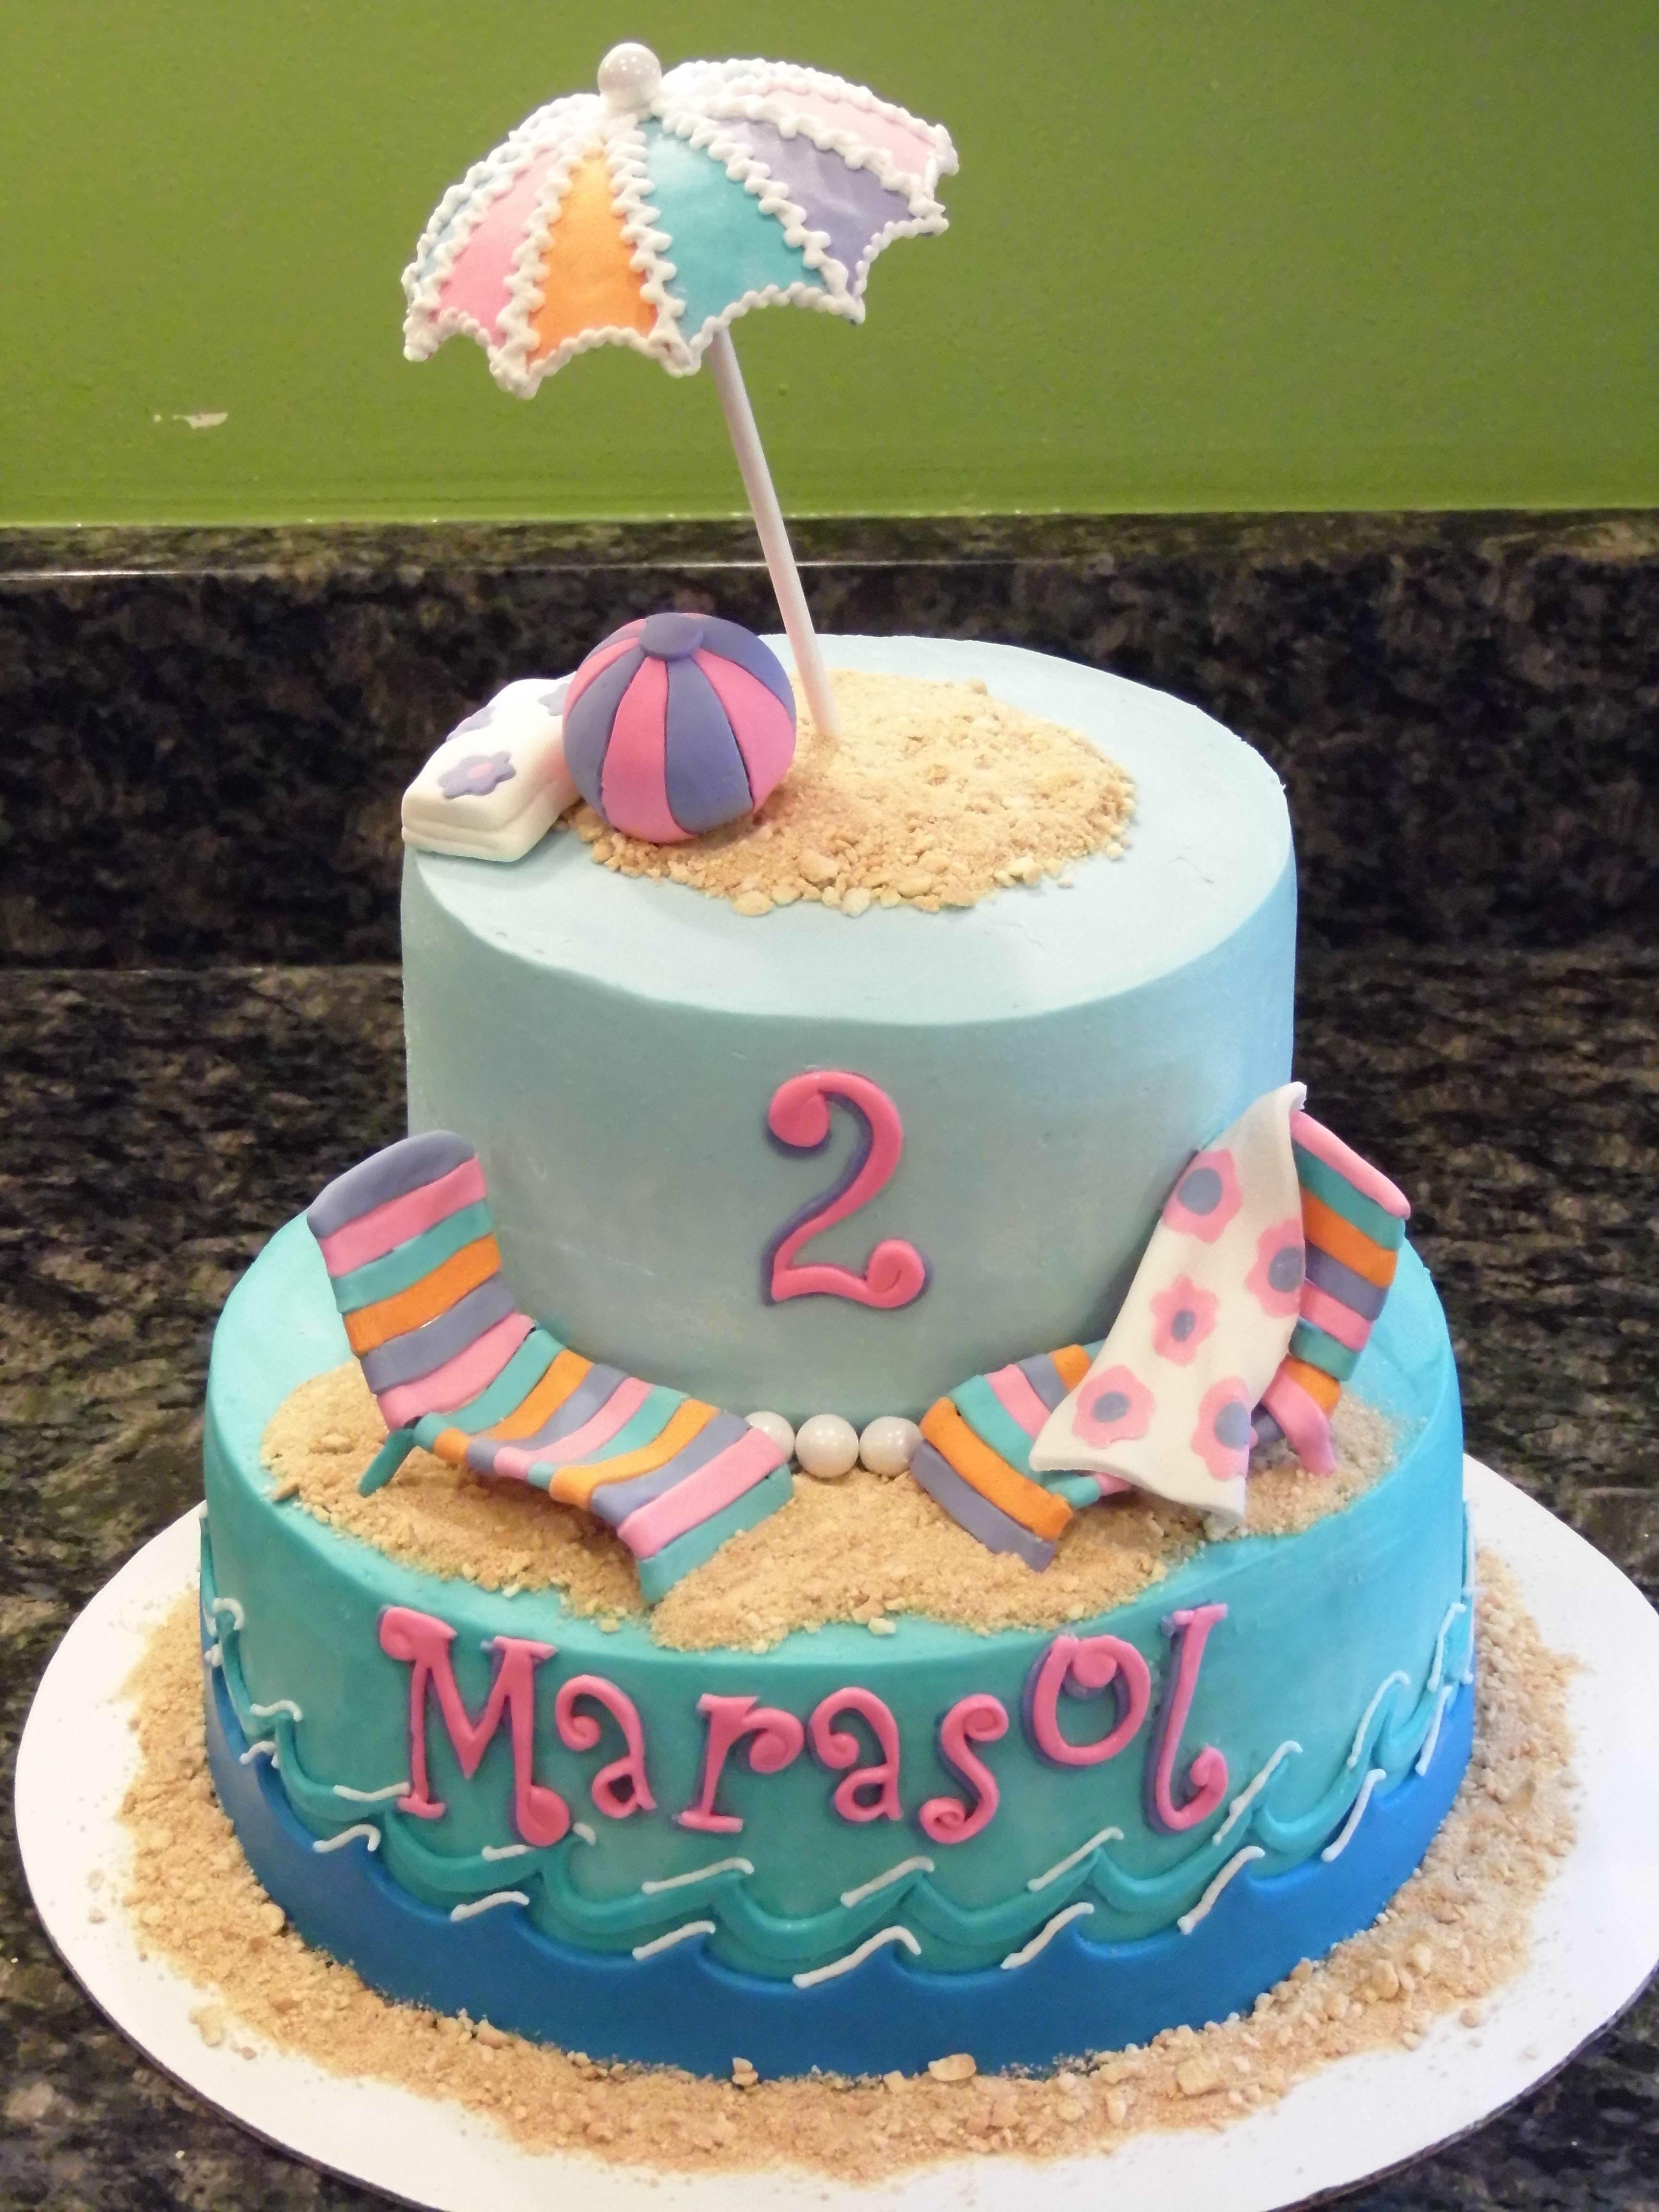 Beach Birthday Cake With Fondant Umbrella And Chairs Ball